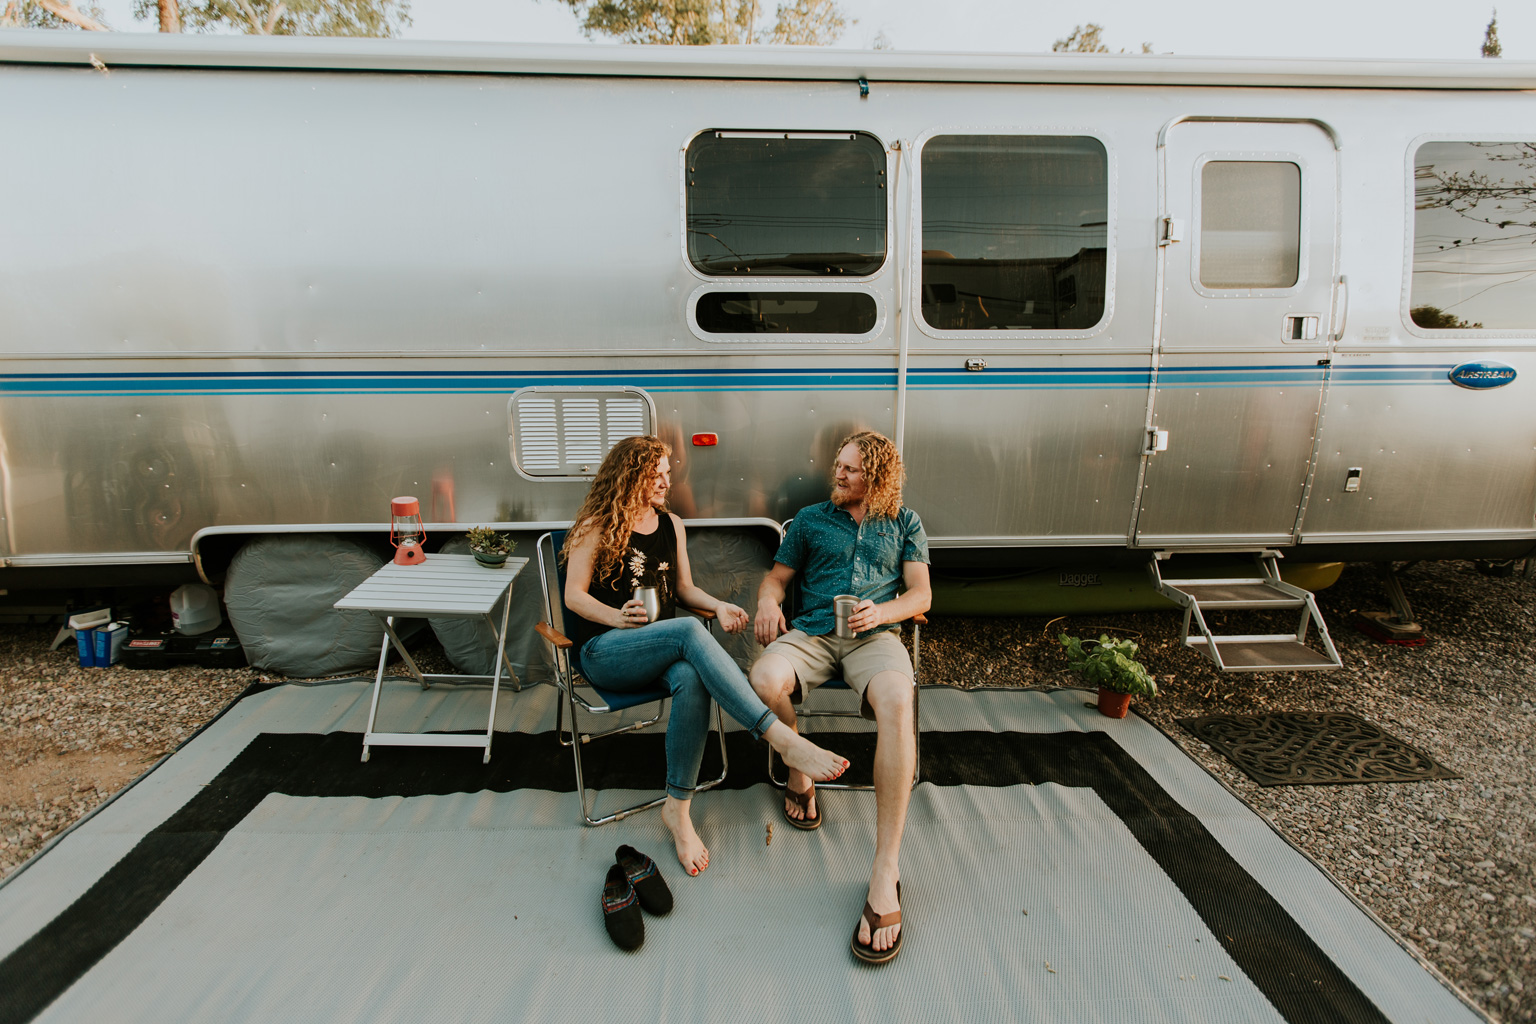 CindyGiovagnoli_Tucson_Arizona_engagement_lifestyle_portrait_Airstream_Excella_travel_trailer_camper_Saguaro_National_Park-050.jpg